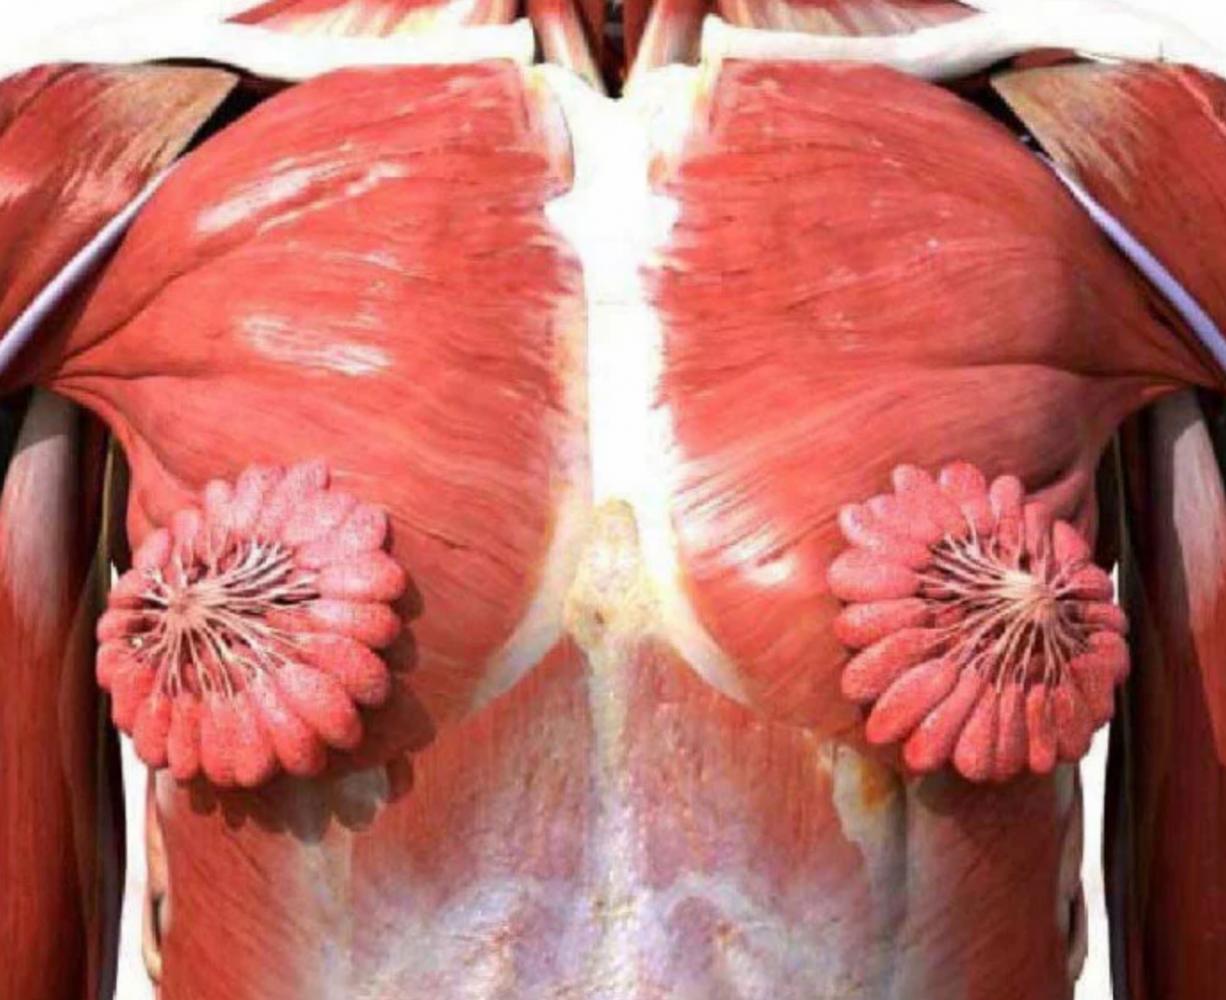 foto real glandulas mamárias 1